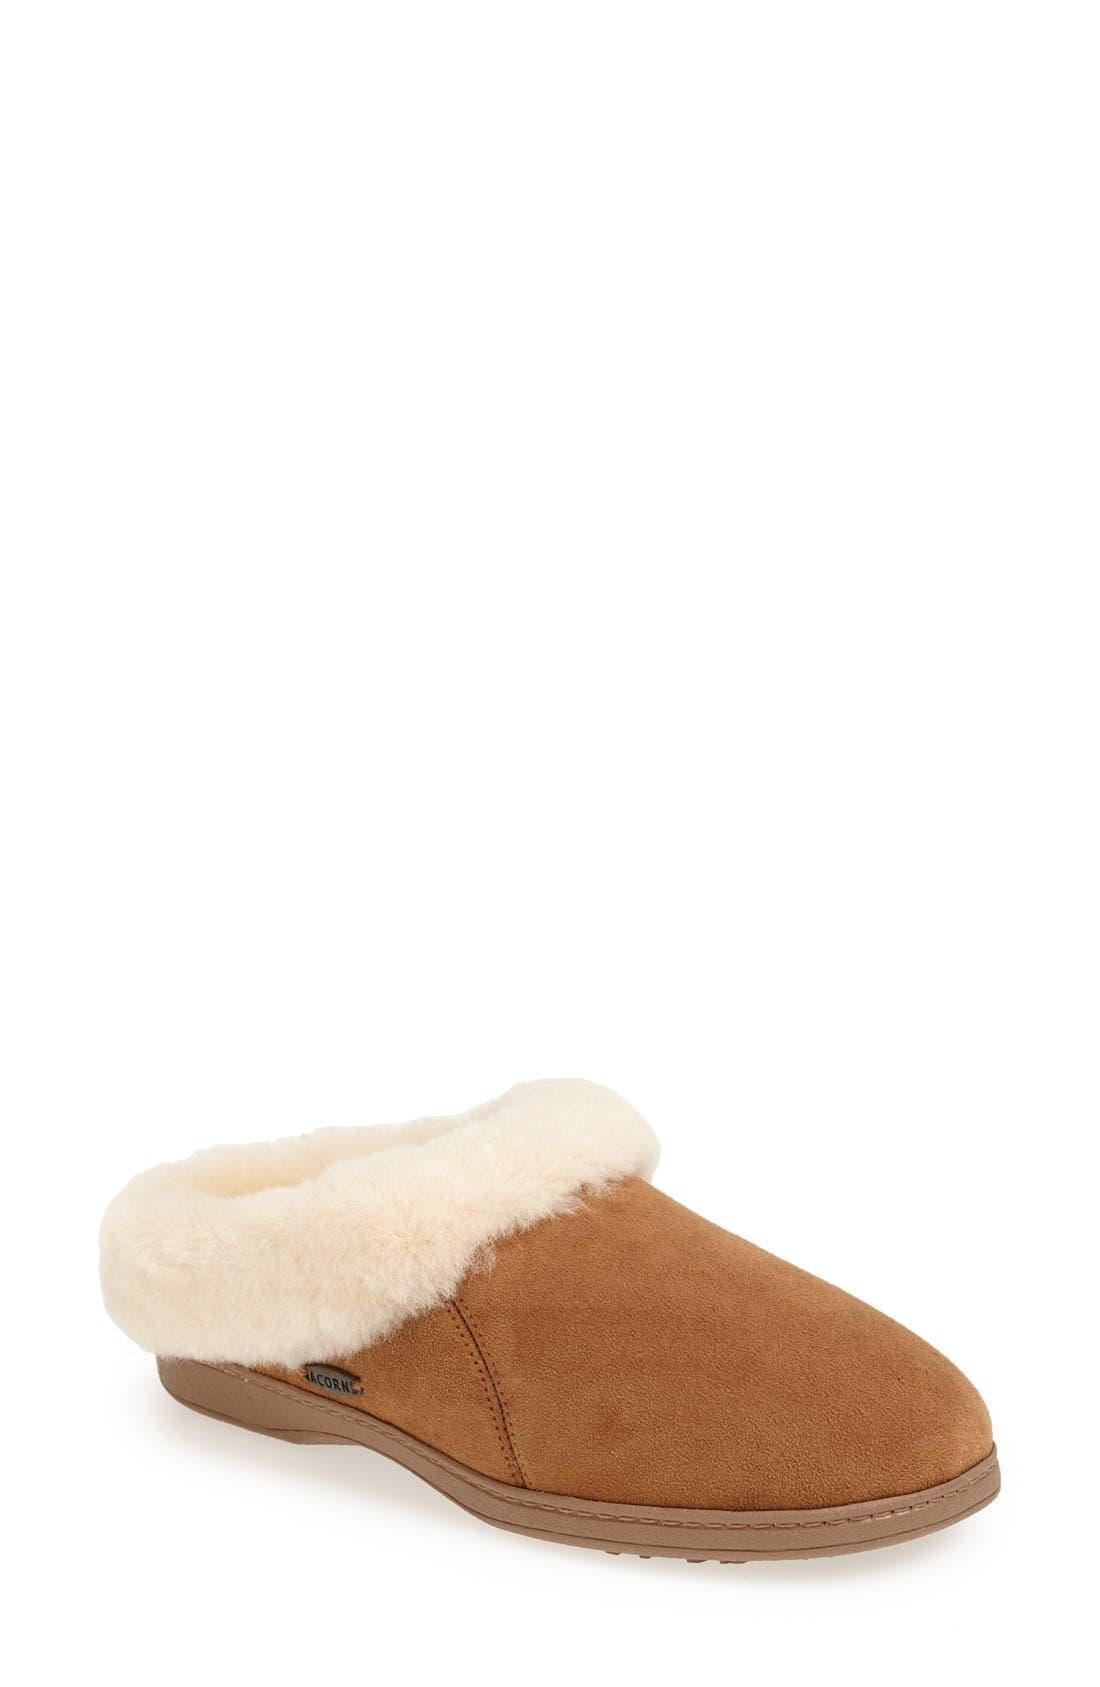 'Ewe Collar' Genuine Sheepskin Mule Slipper,                             Main thumbnail 1, color,                             WALNUT